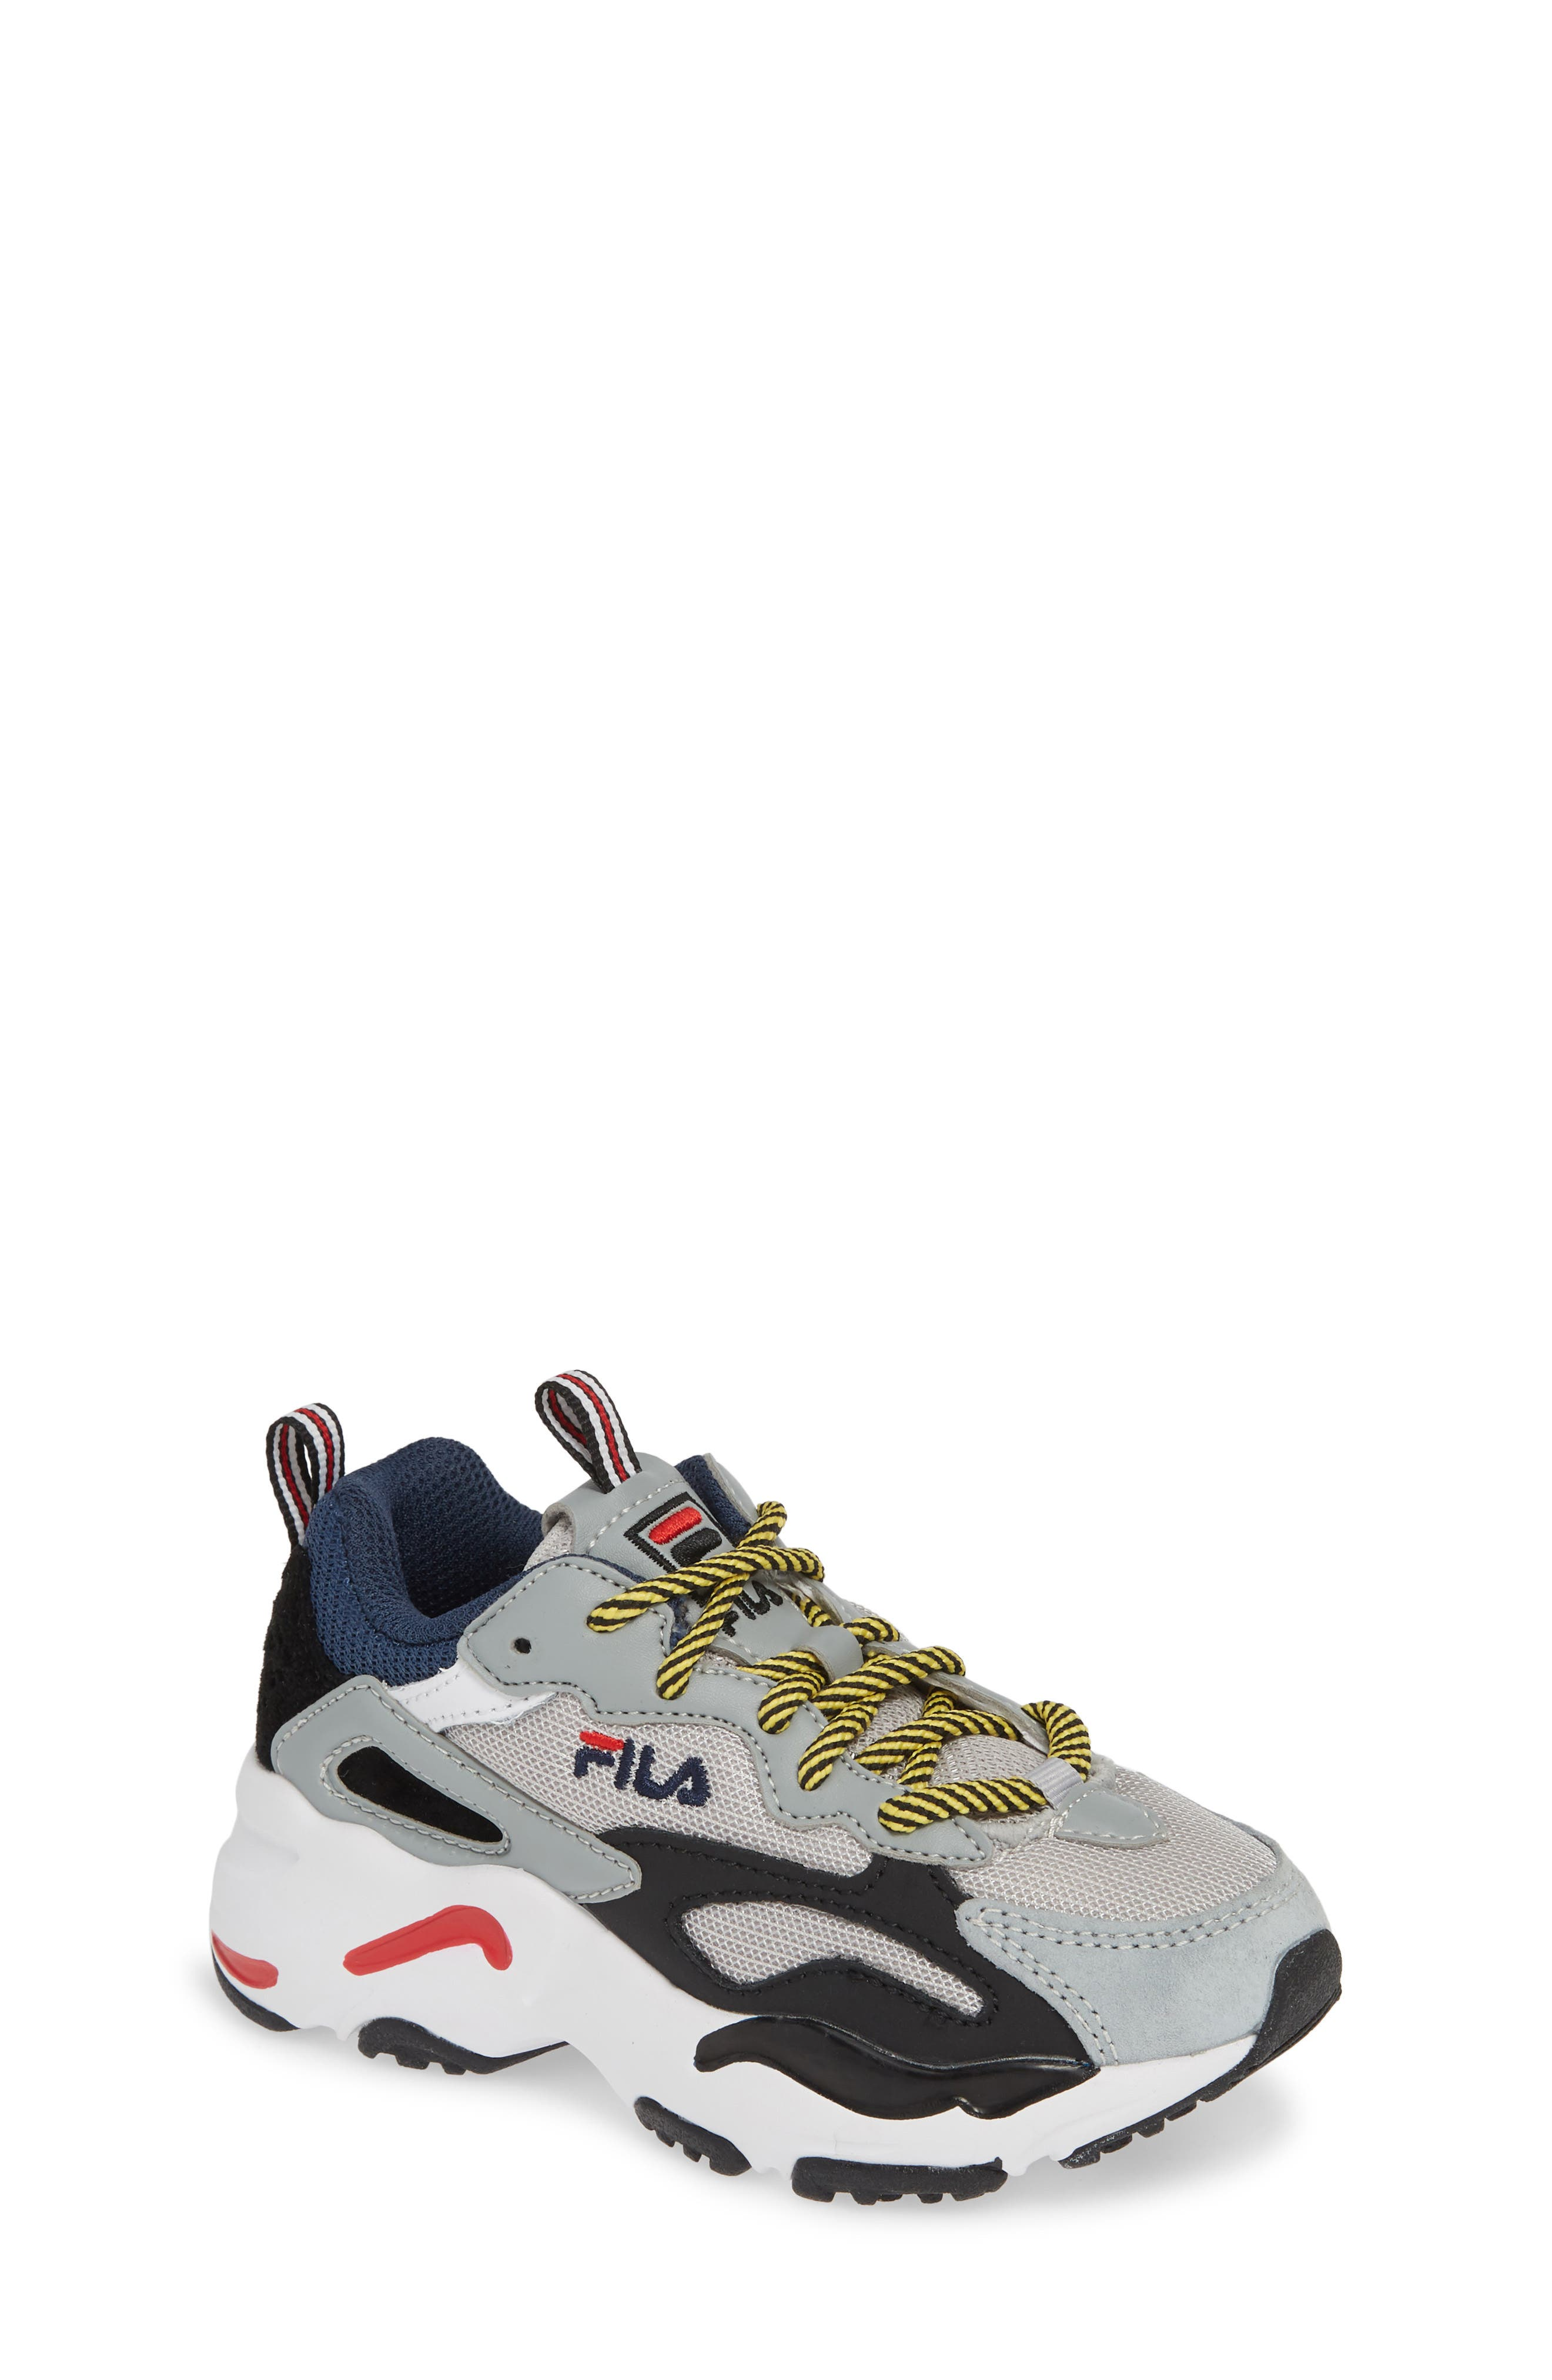 FILA,                             Ray Tracer Sneaker,                             Main thumbnail 1, color,                             VAPOR BLUE/ HIGHRISE/ BLACK